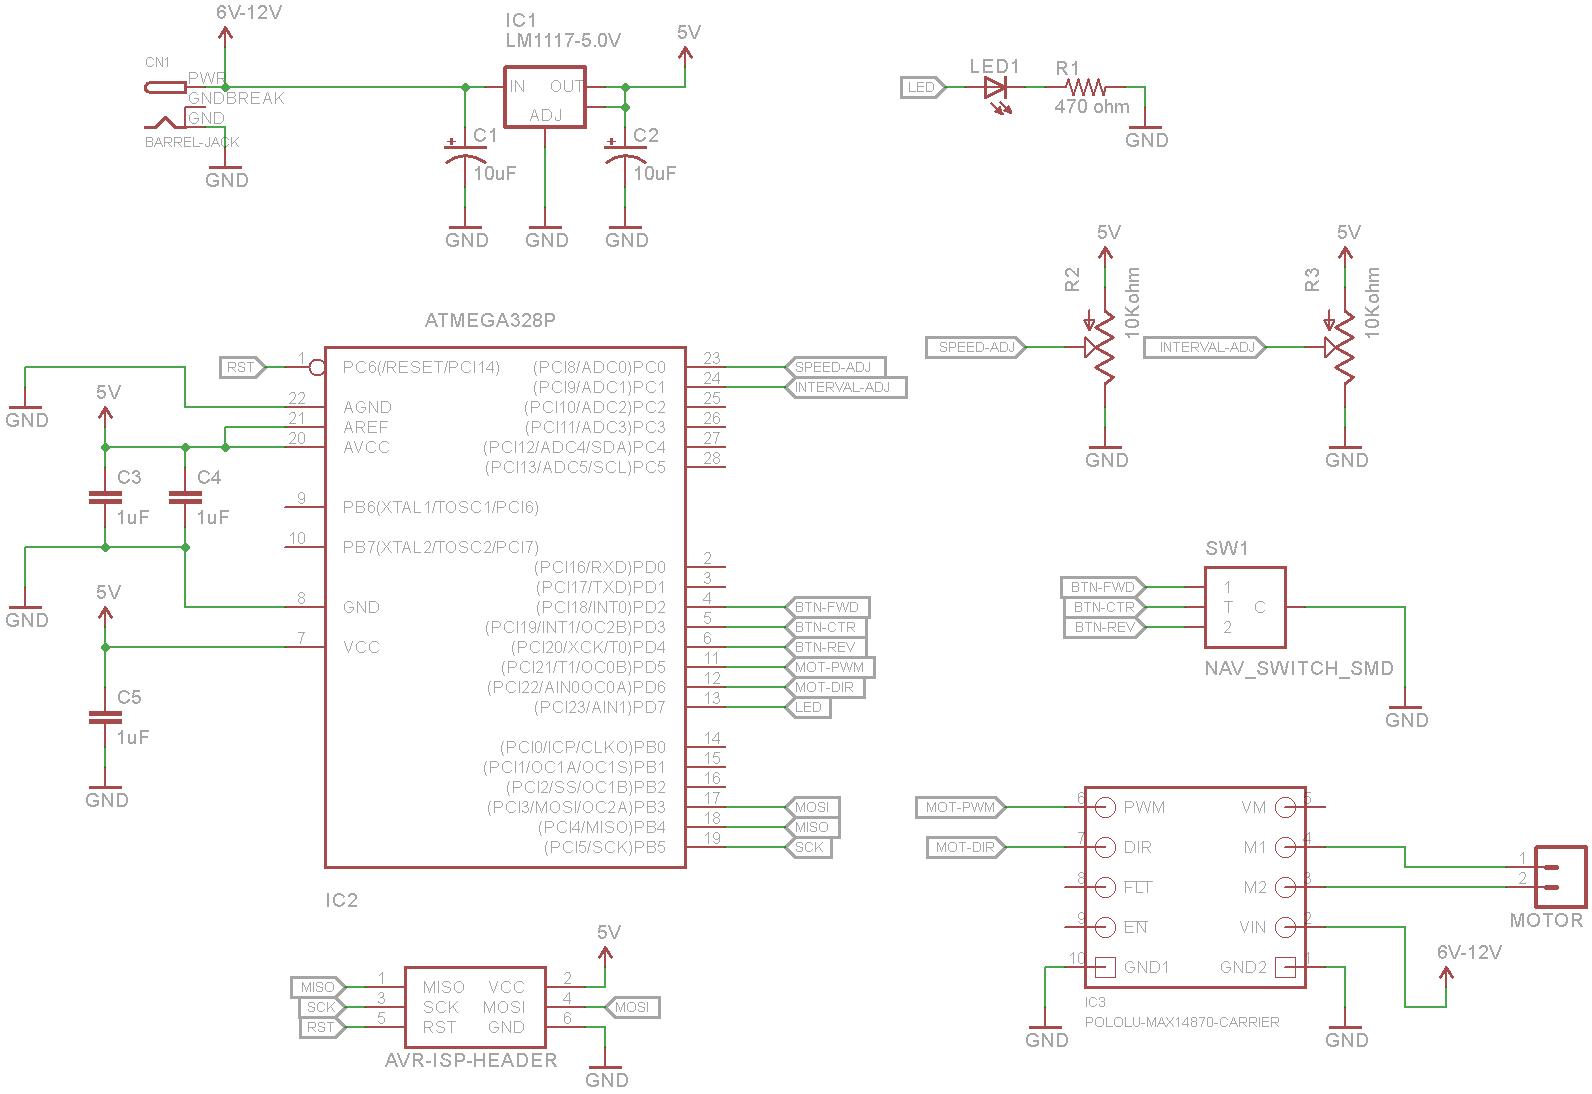 3d Printed Peristaltic Pump Eleccelerator 6v To 12v Wiring Diagram Circuit